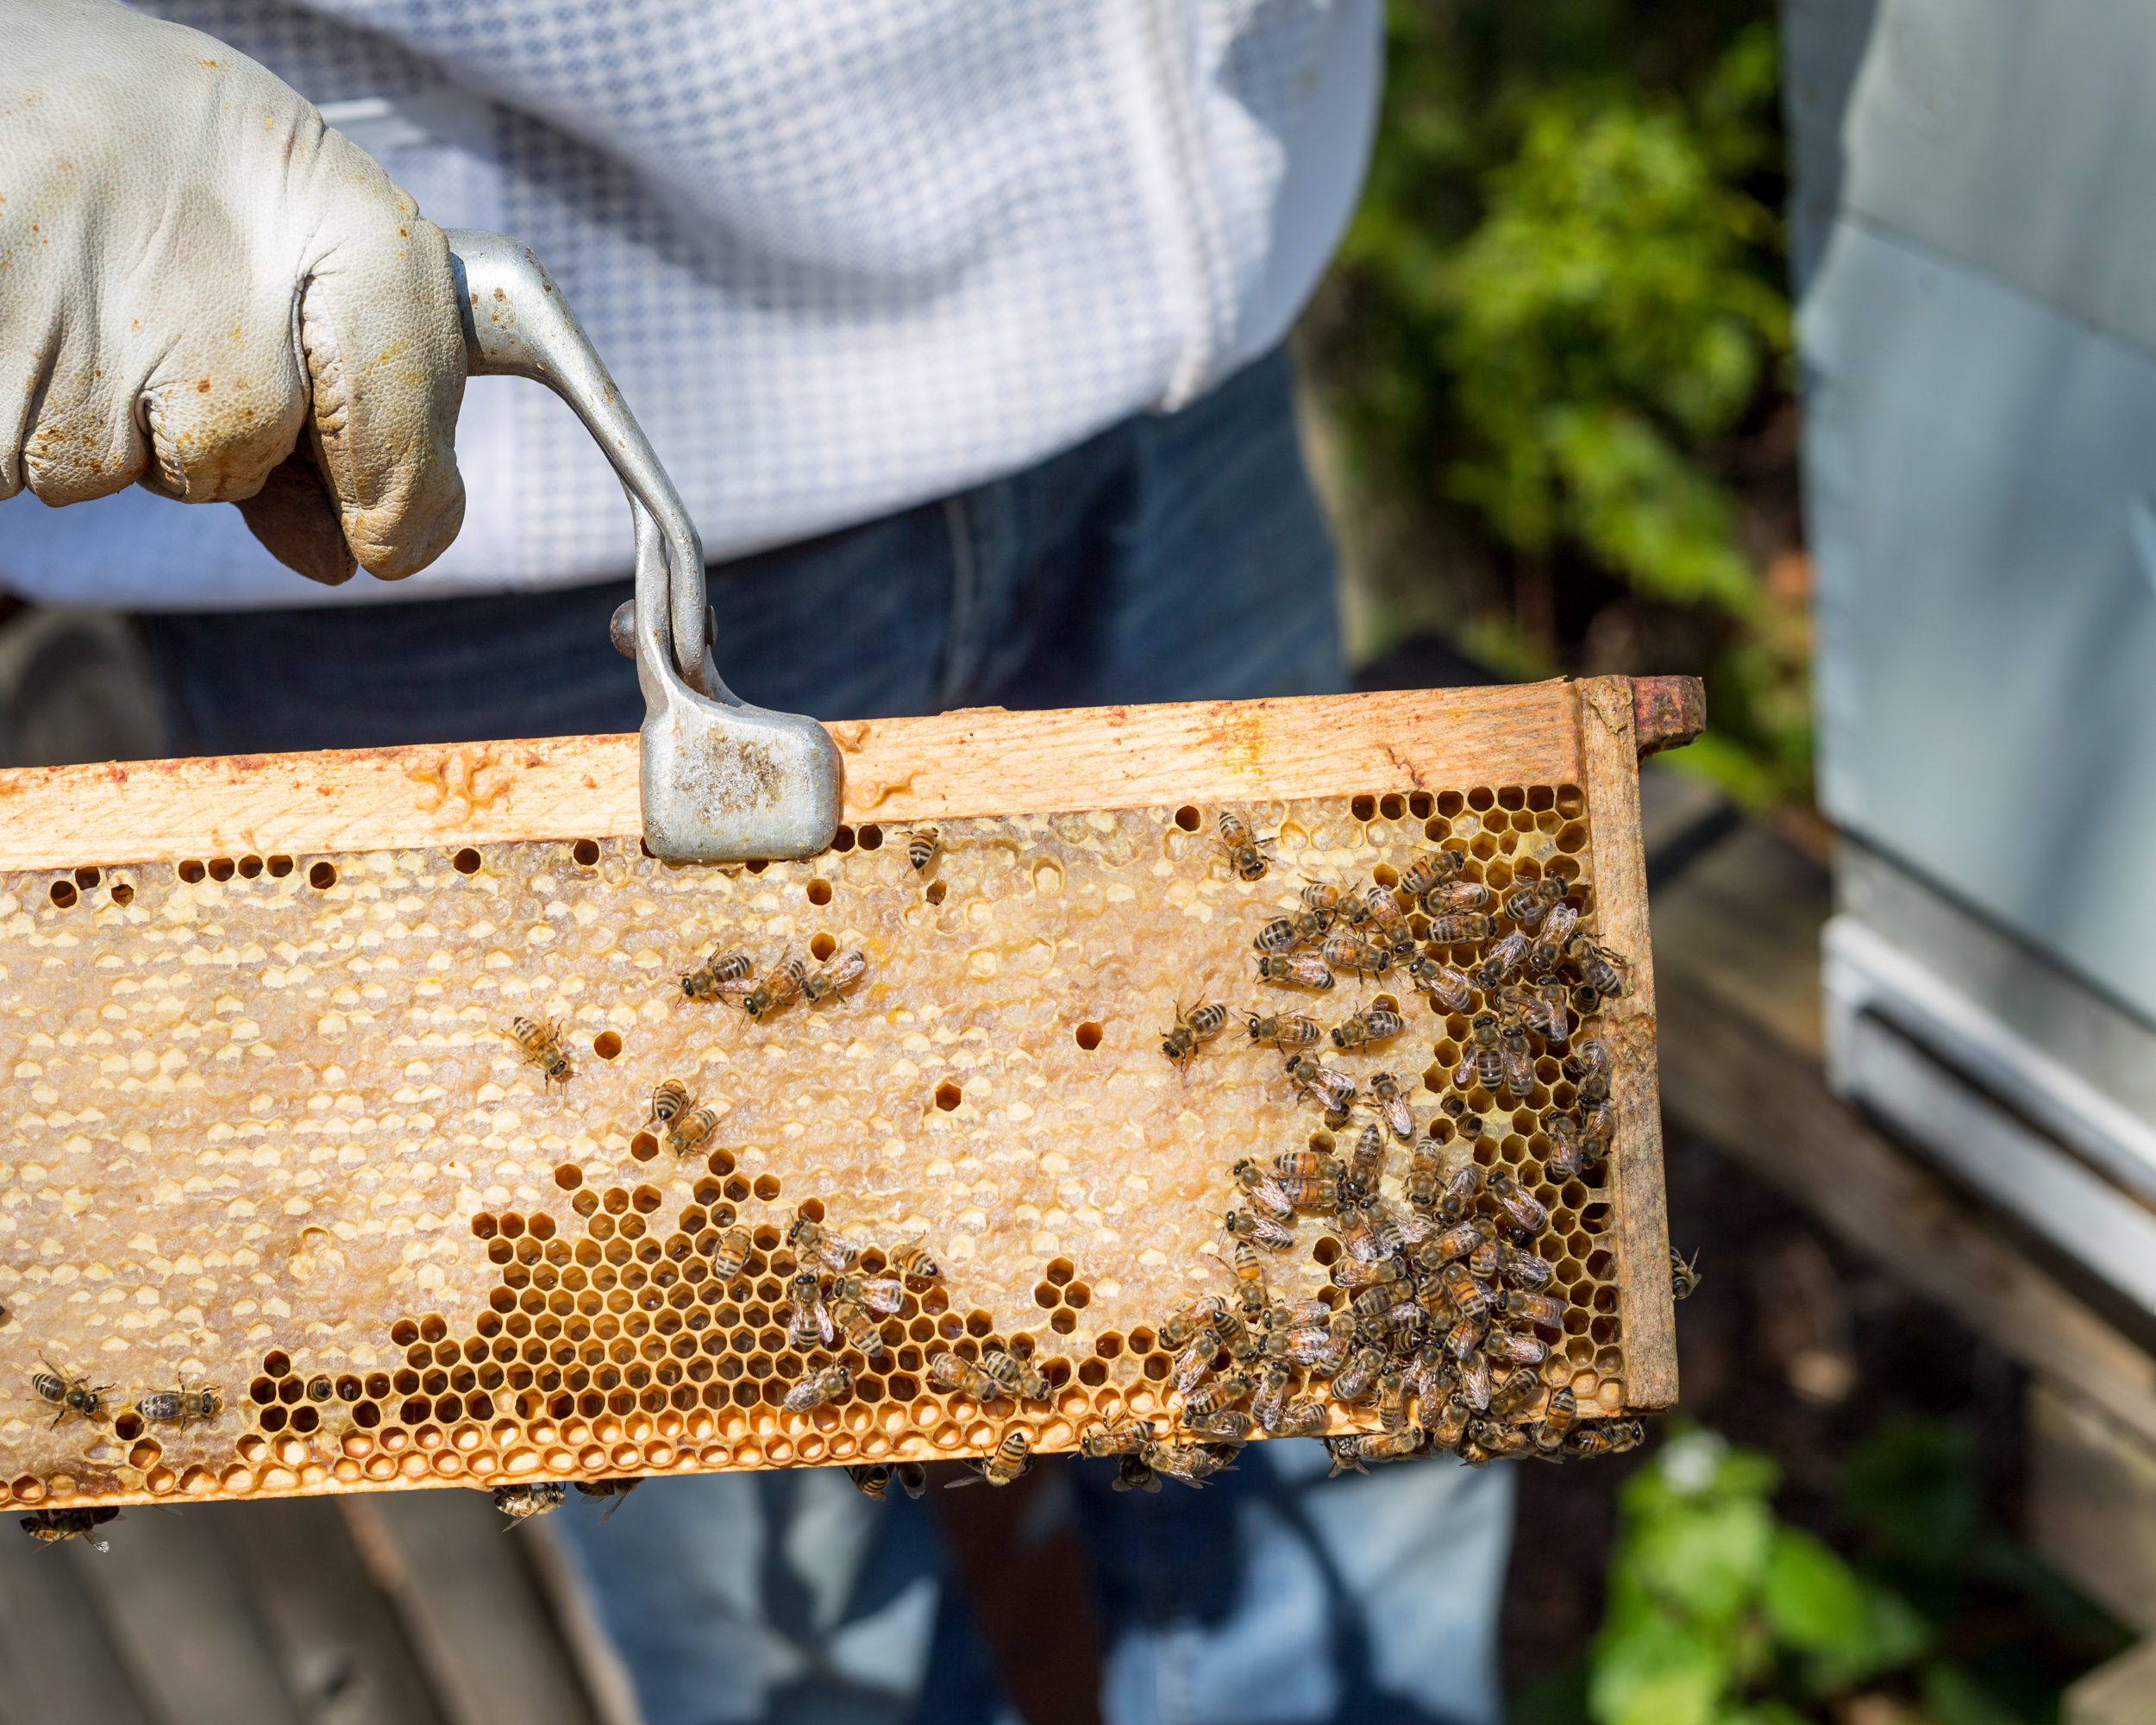 Beekeeper-1.jpg